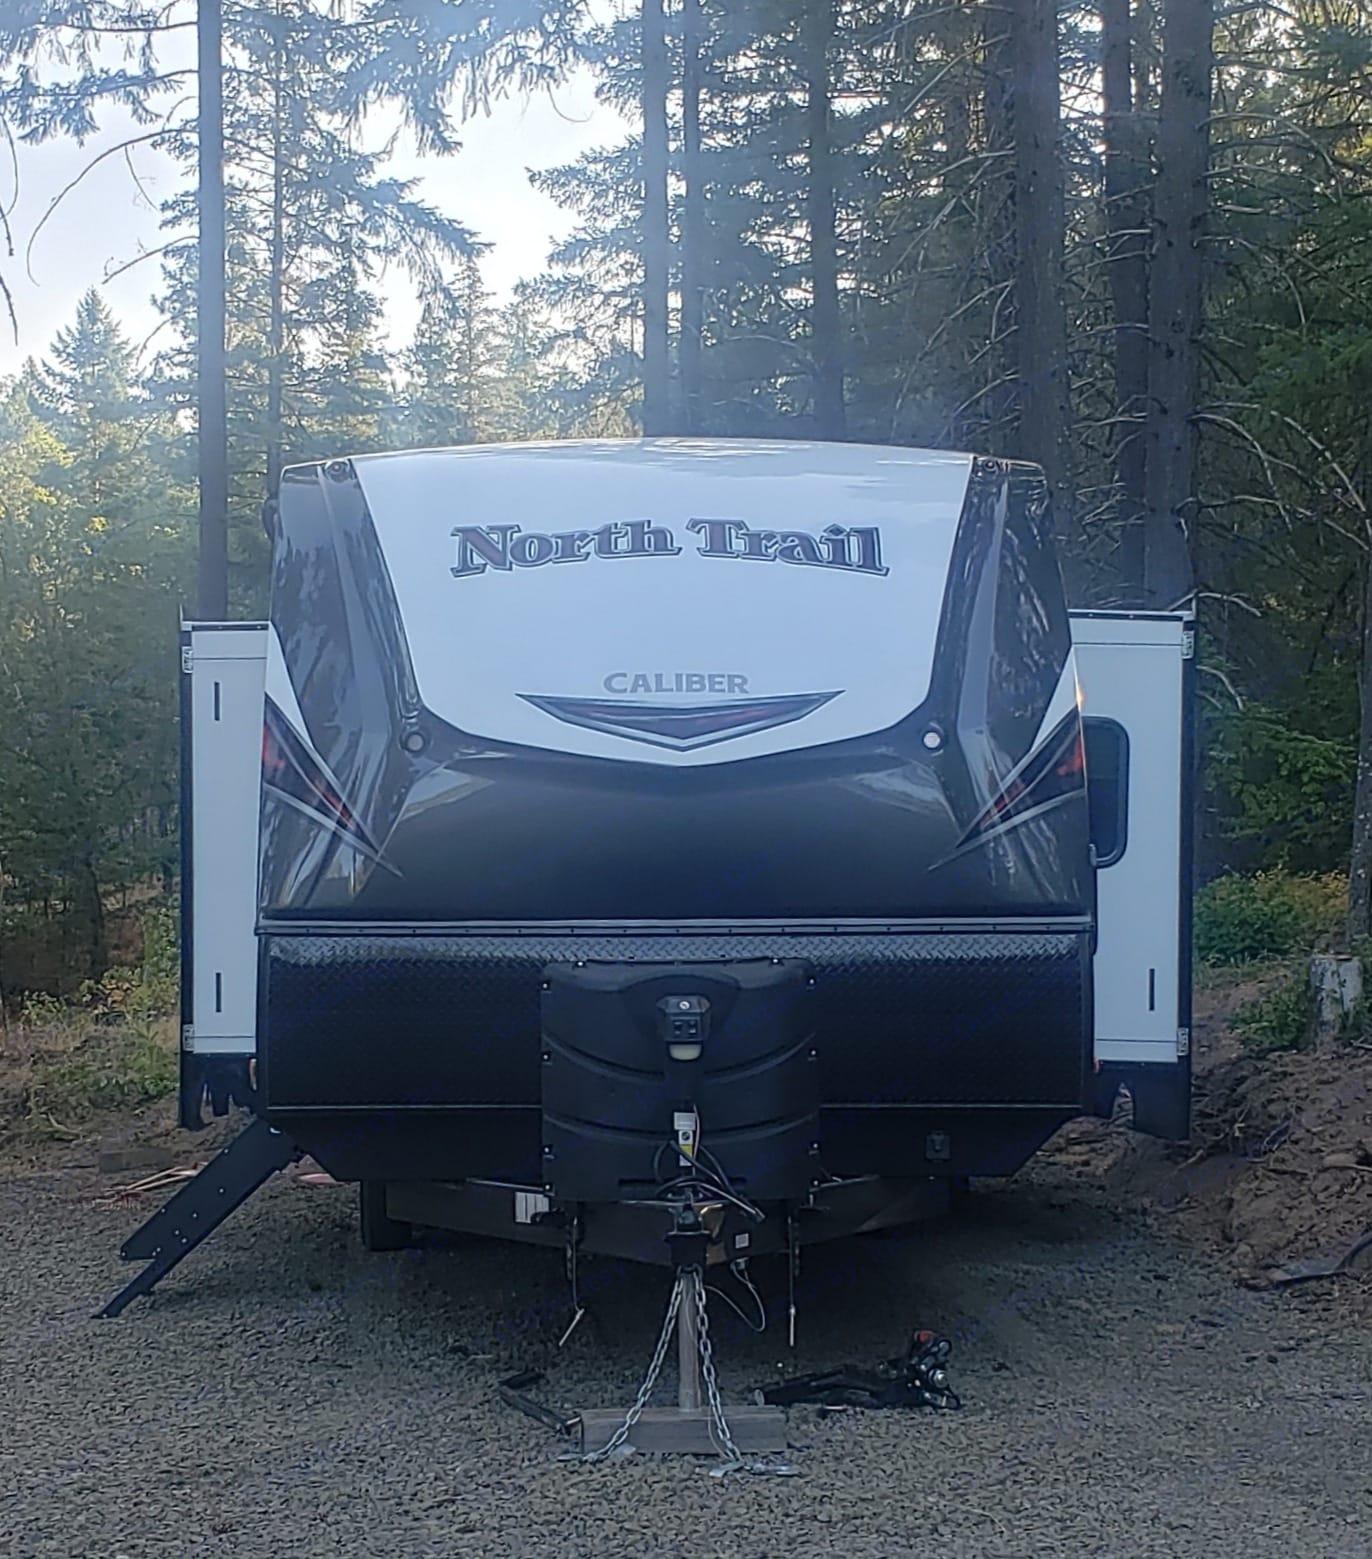 Heartland North Trail 2020